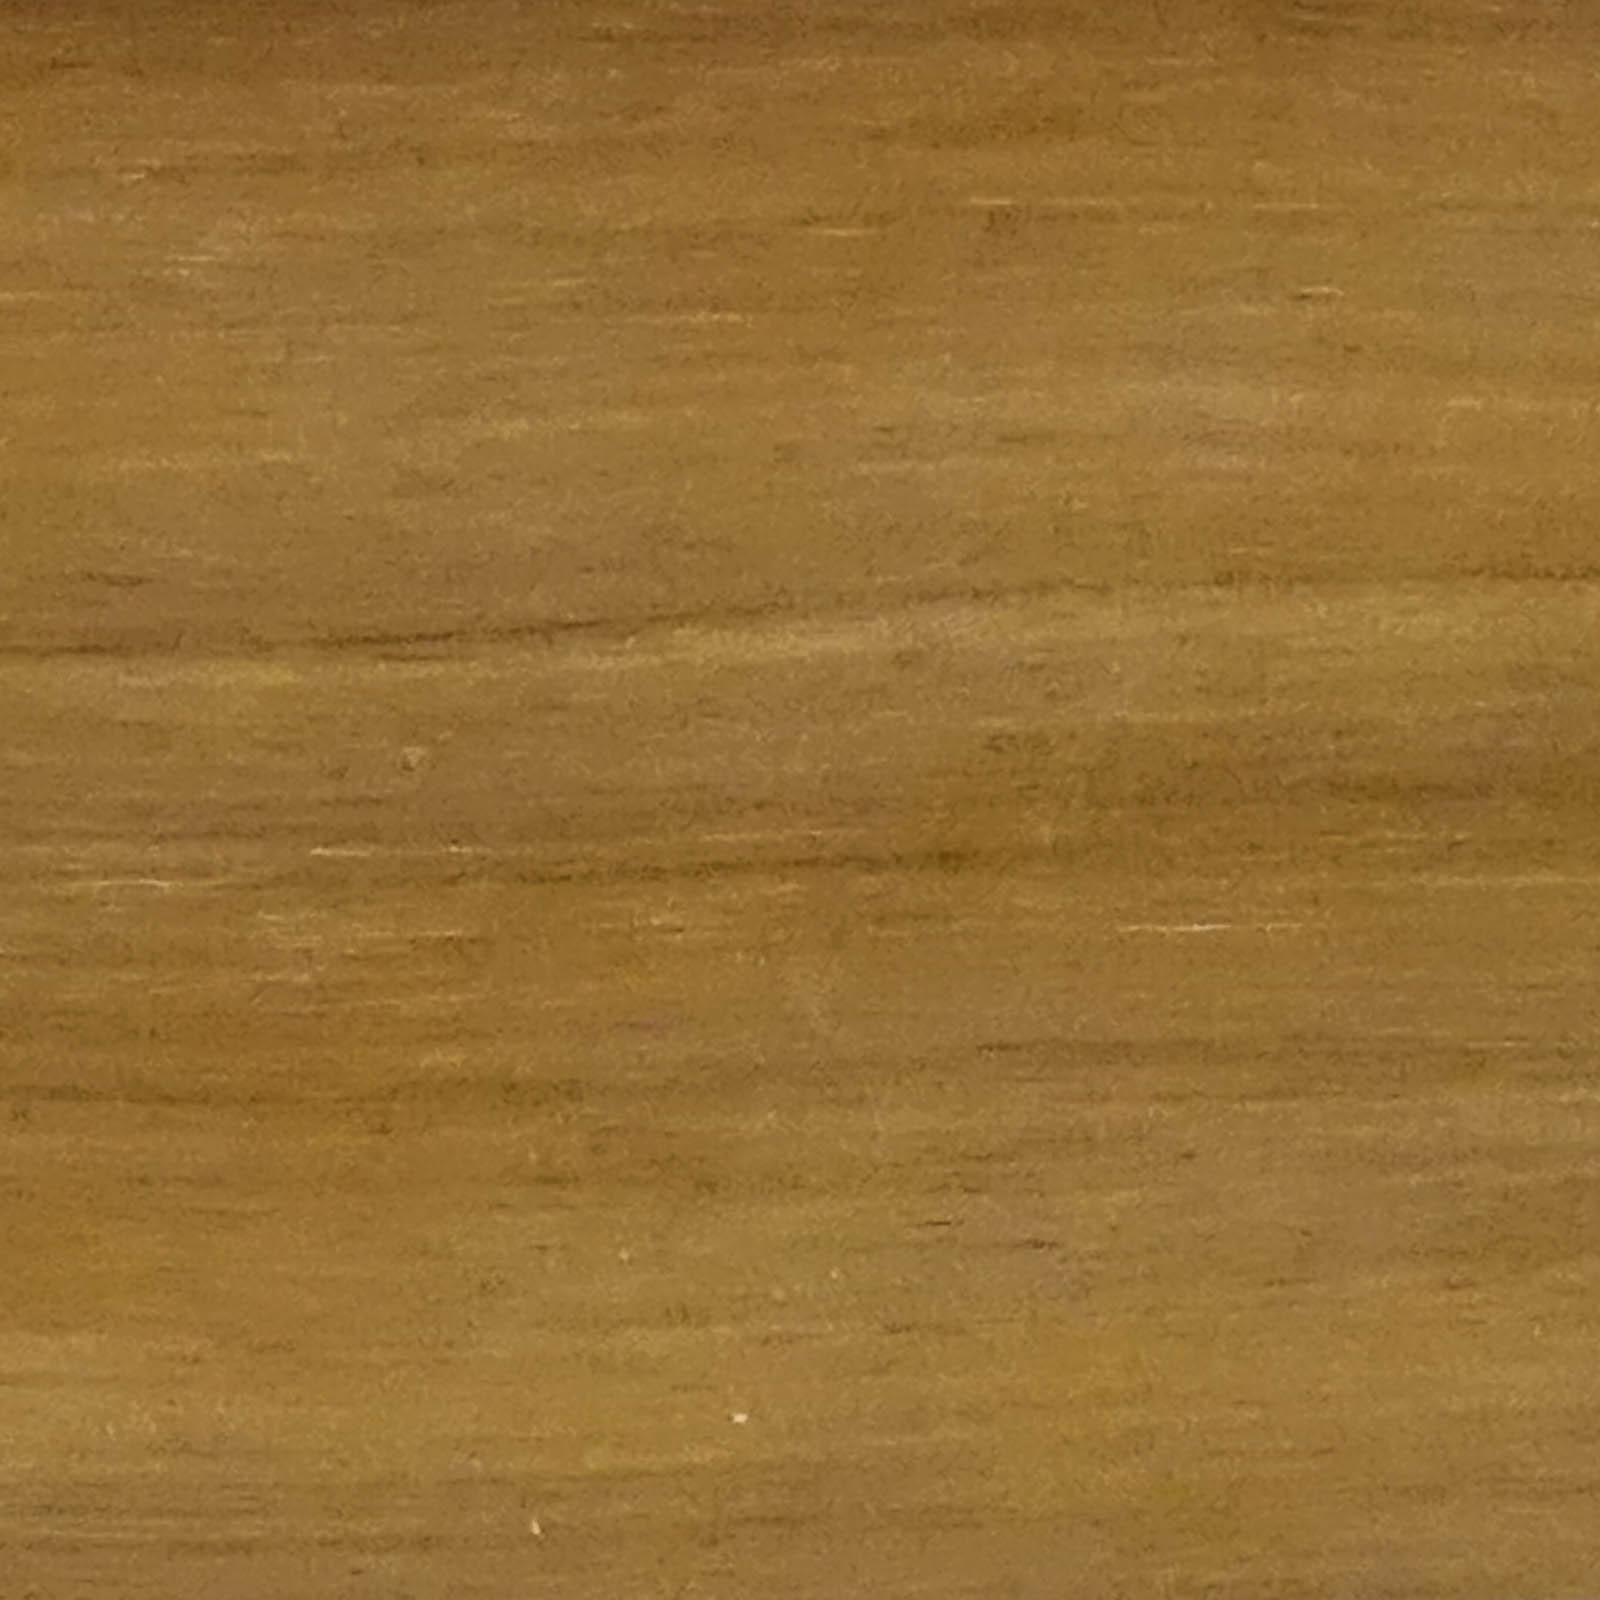 21x3x19 cm Off Cuts Mould Master Assorted Veneer Wood Brown 100 g